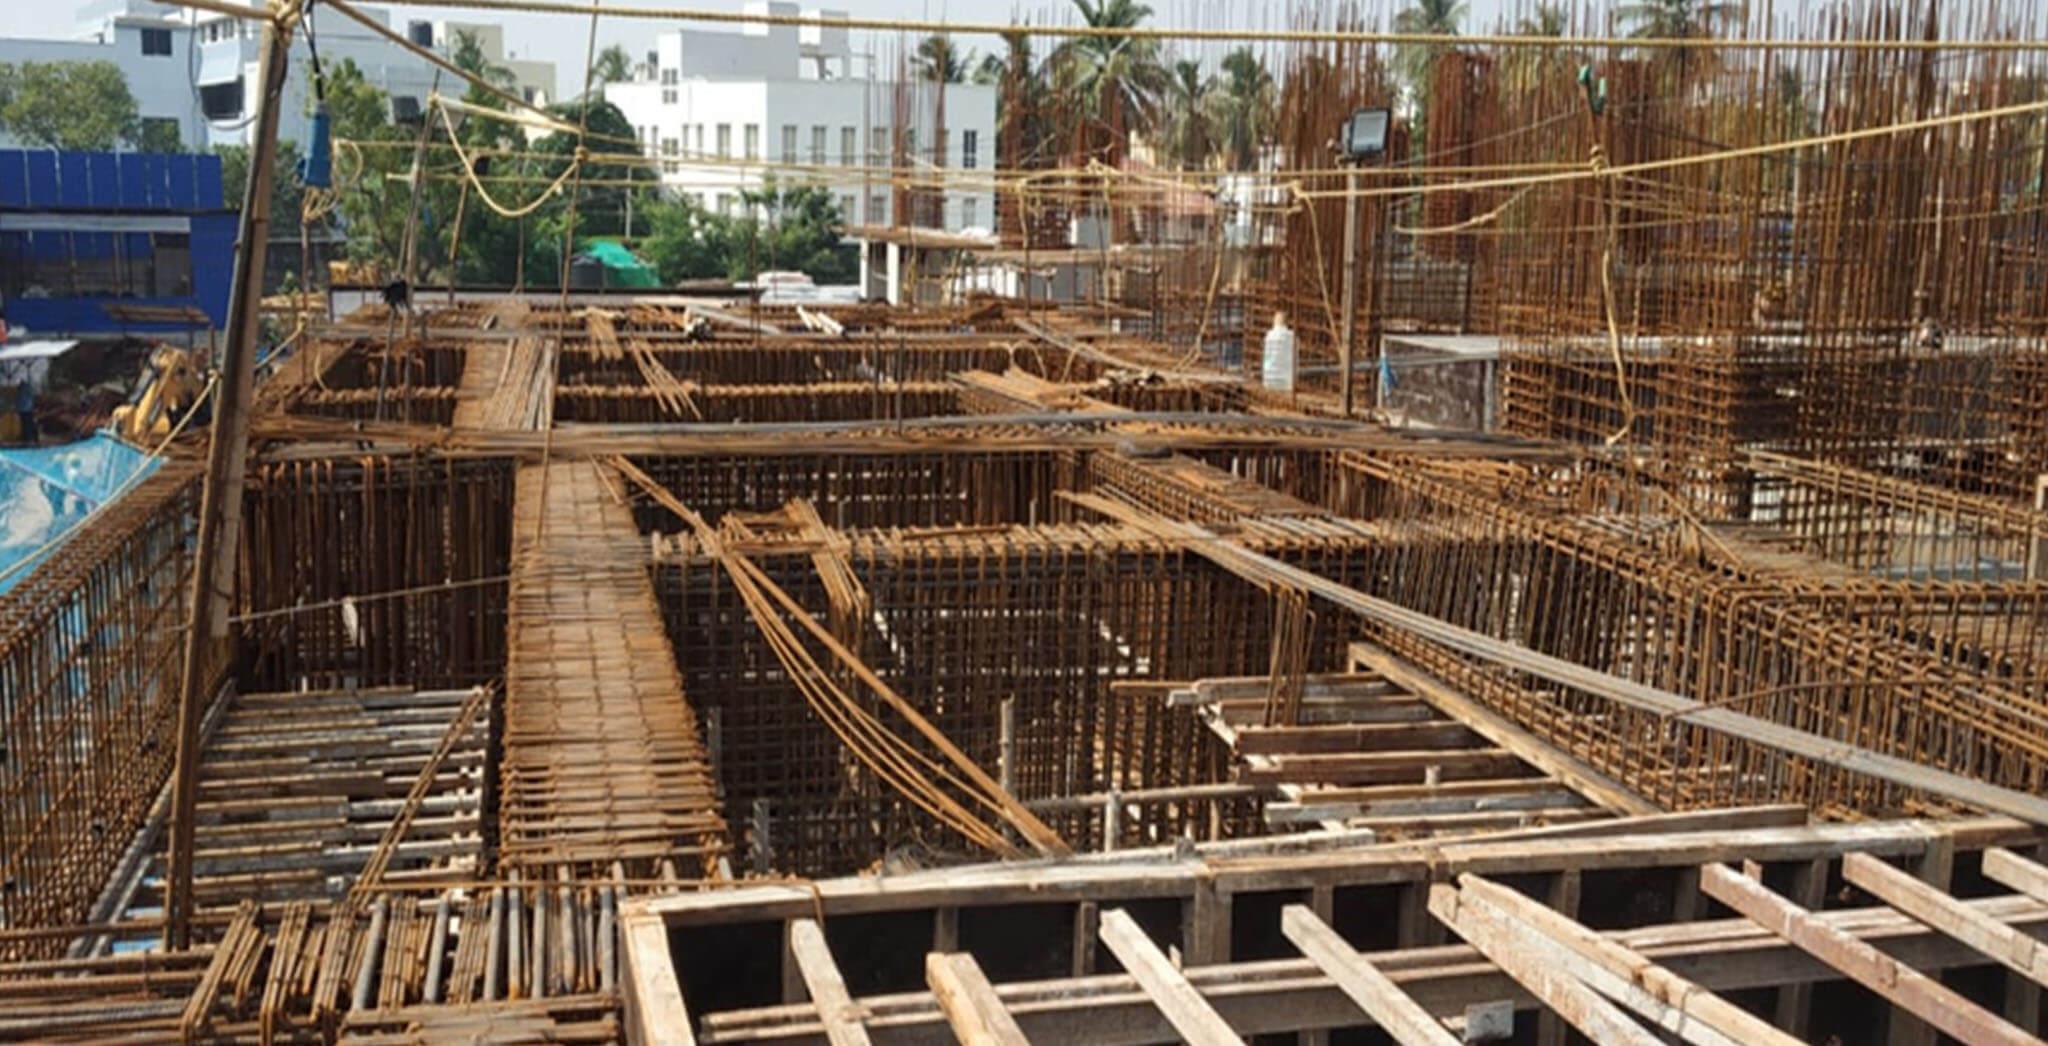 Dec 2020 - Tower A1: First floor level slab reinforcement work-in-progress